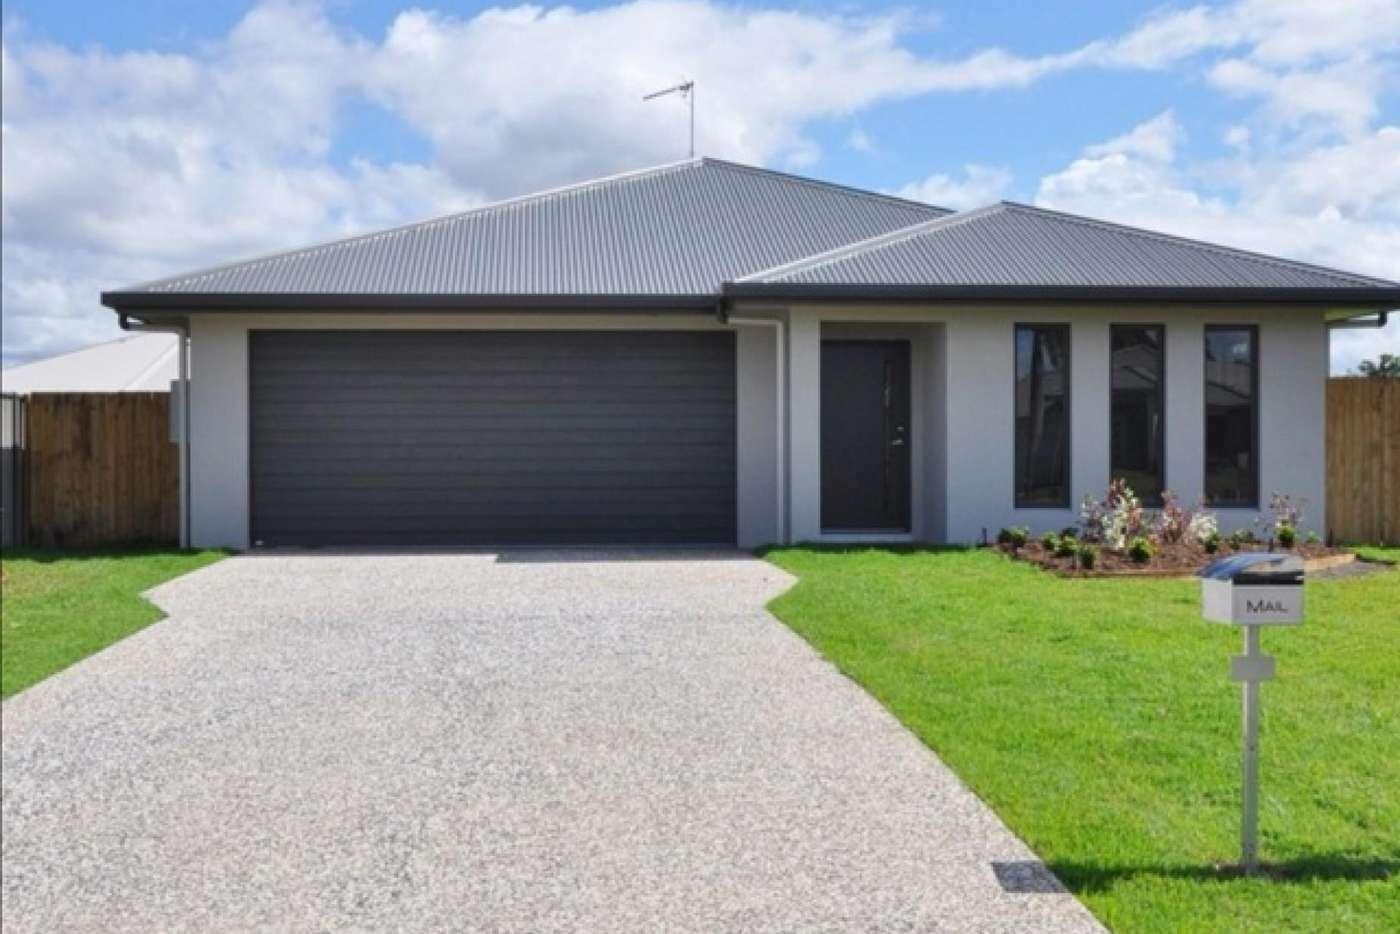 Main view of Homely house listing, 5 Eagle Close, Mareeba QLD 4880